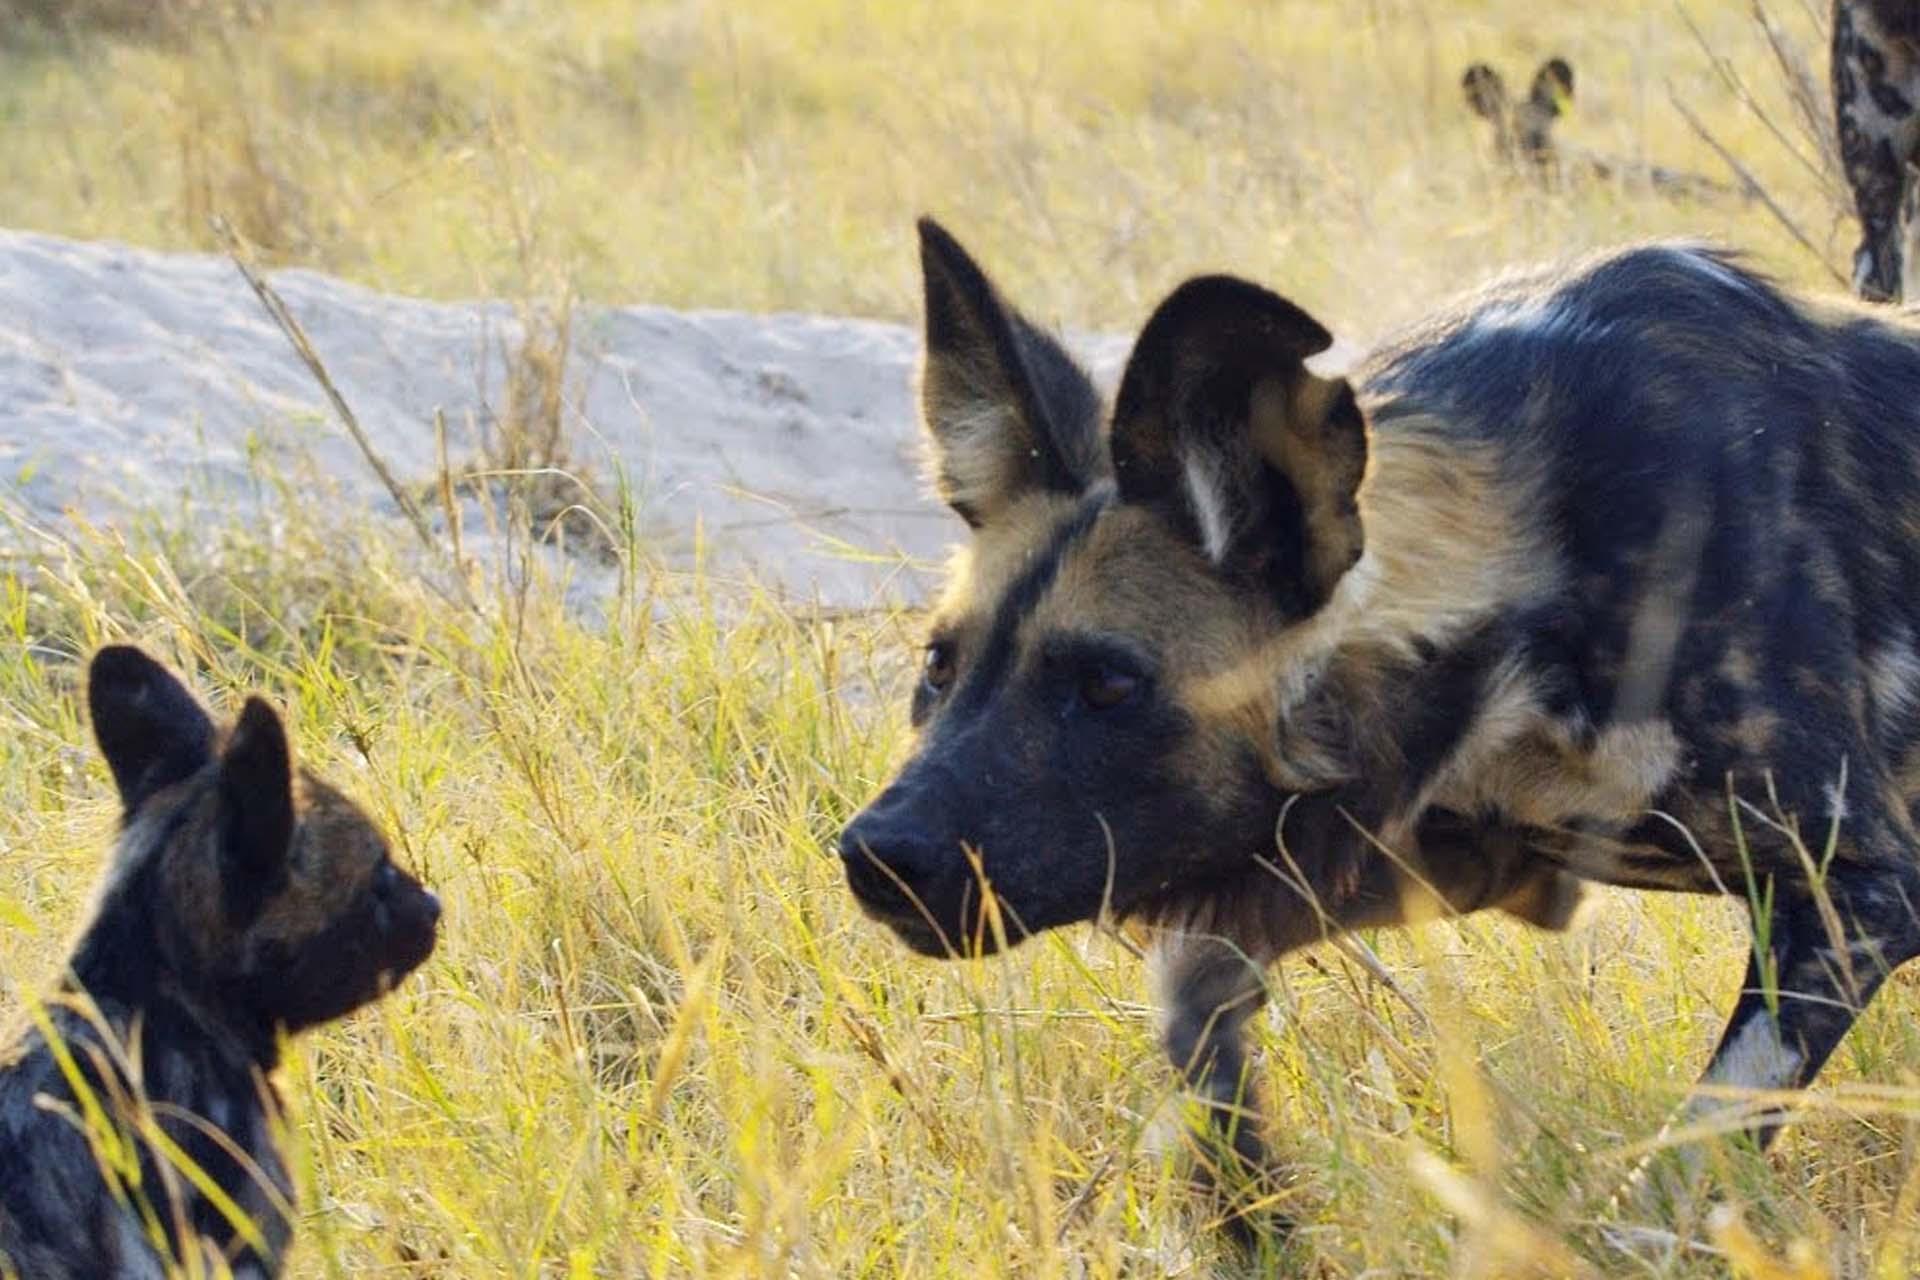 Spy Puppy Meets Wild Dogs